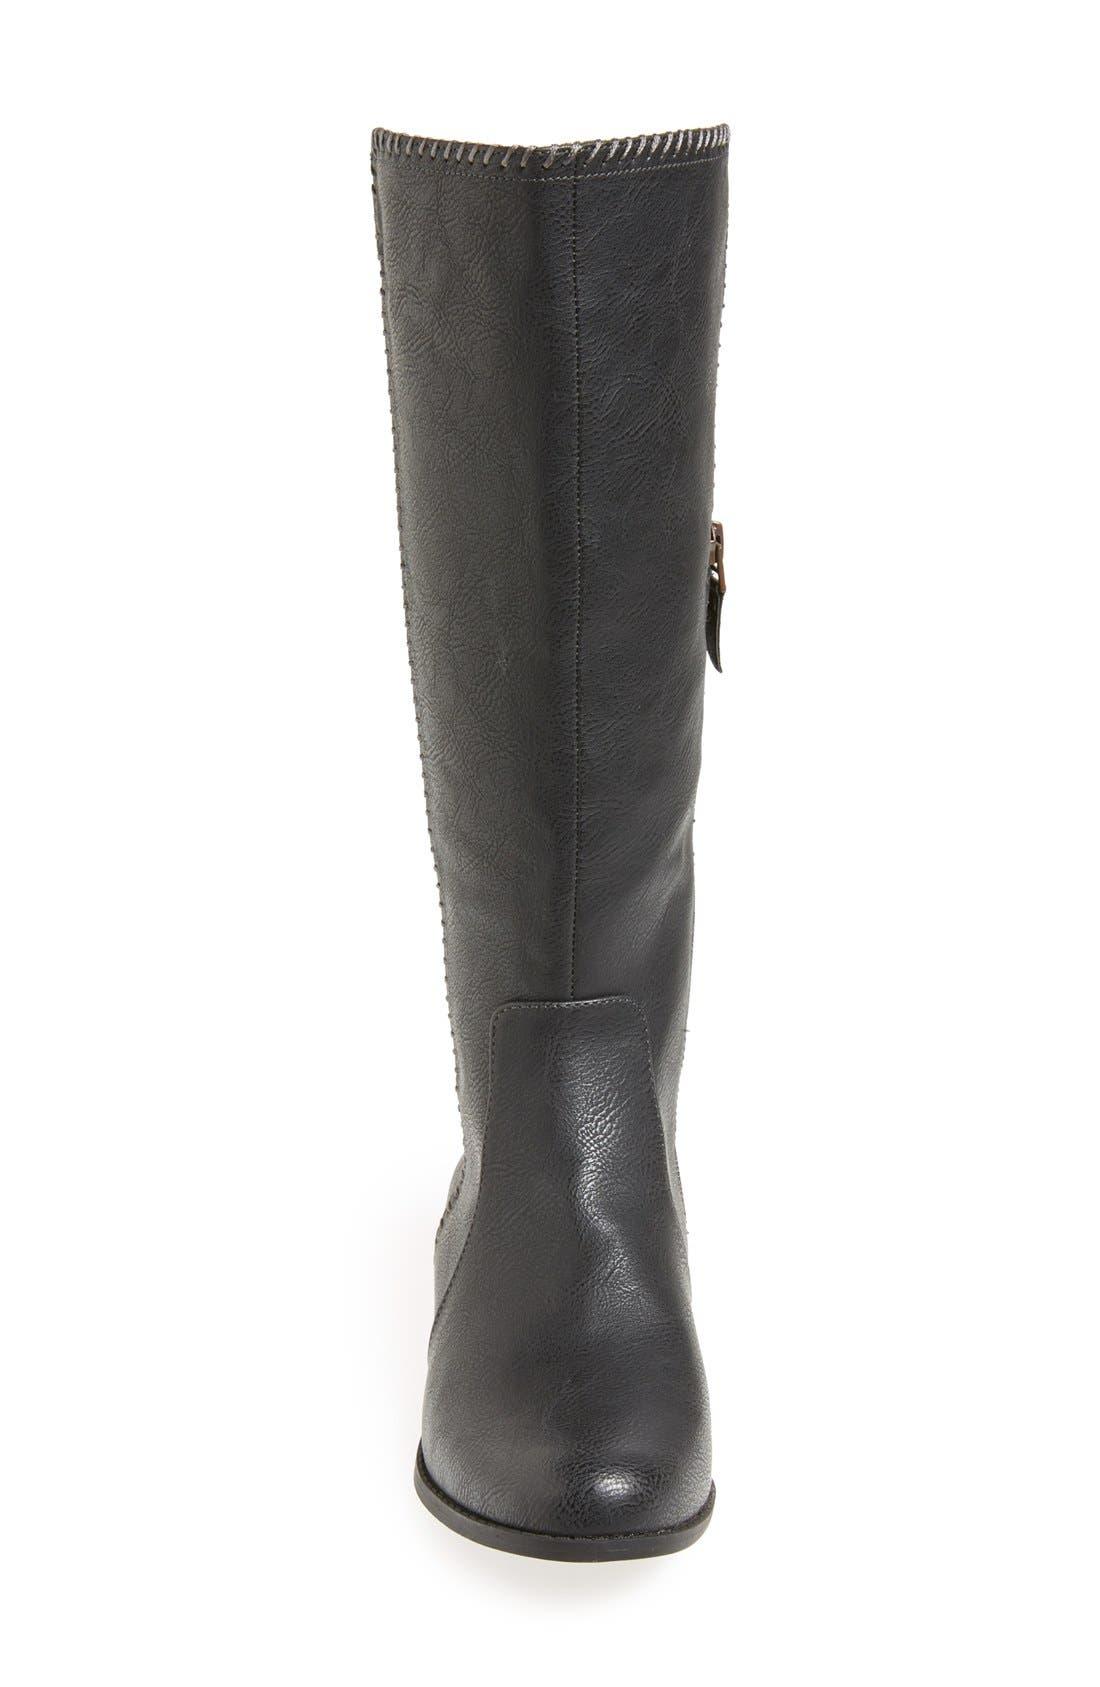 Alternate Image 3  - Dr. Scholl's 'Confess' Riding Boot (Women) (Wide Calf)